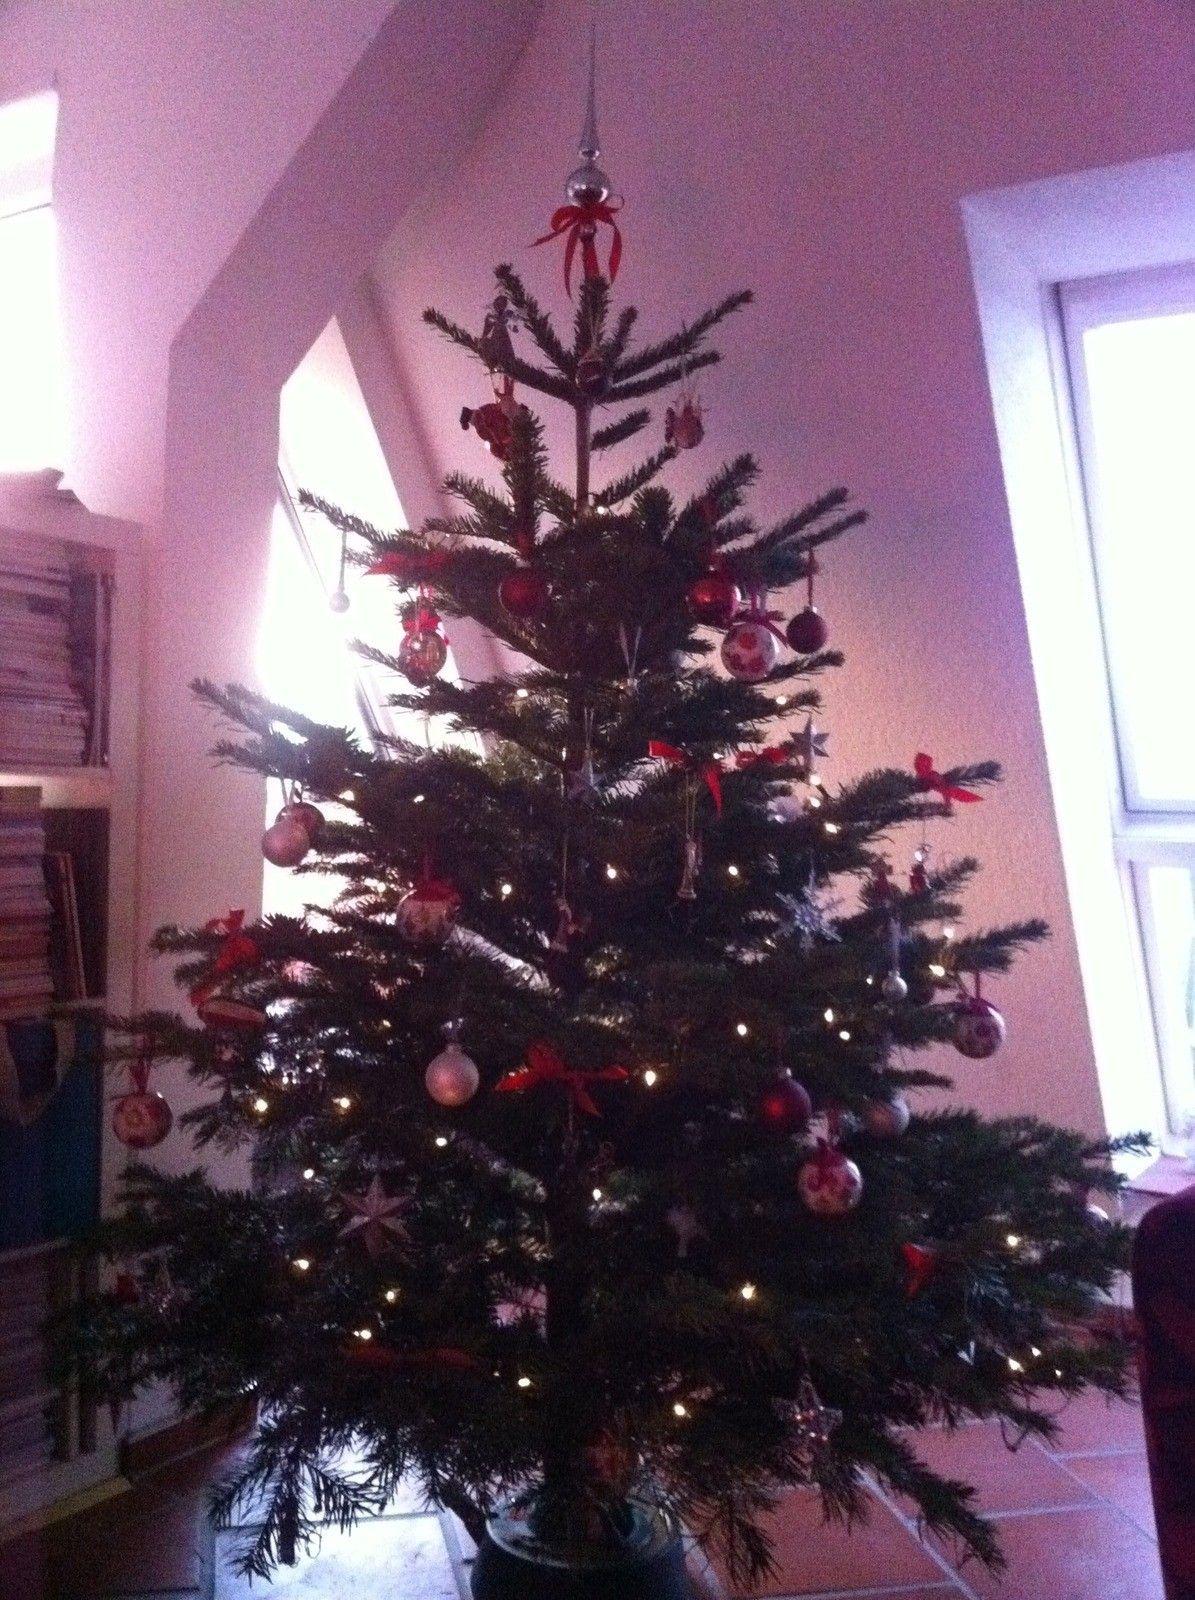 Show Us Your X-mas Tree! - xmastreei.jpg